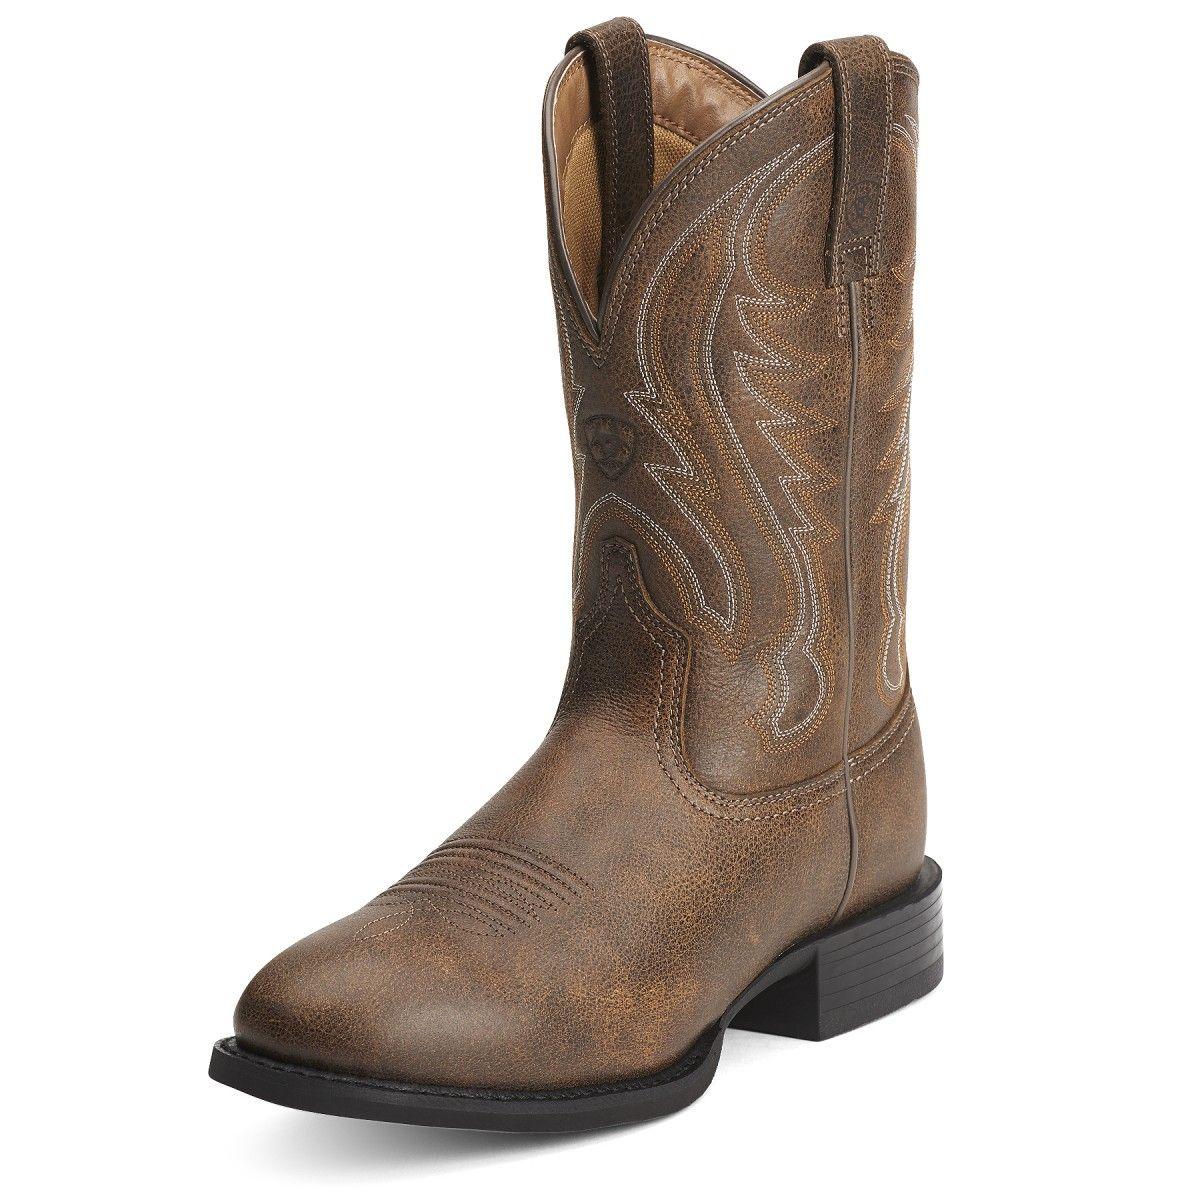 Ariat Western Boots Australia